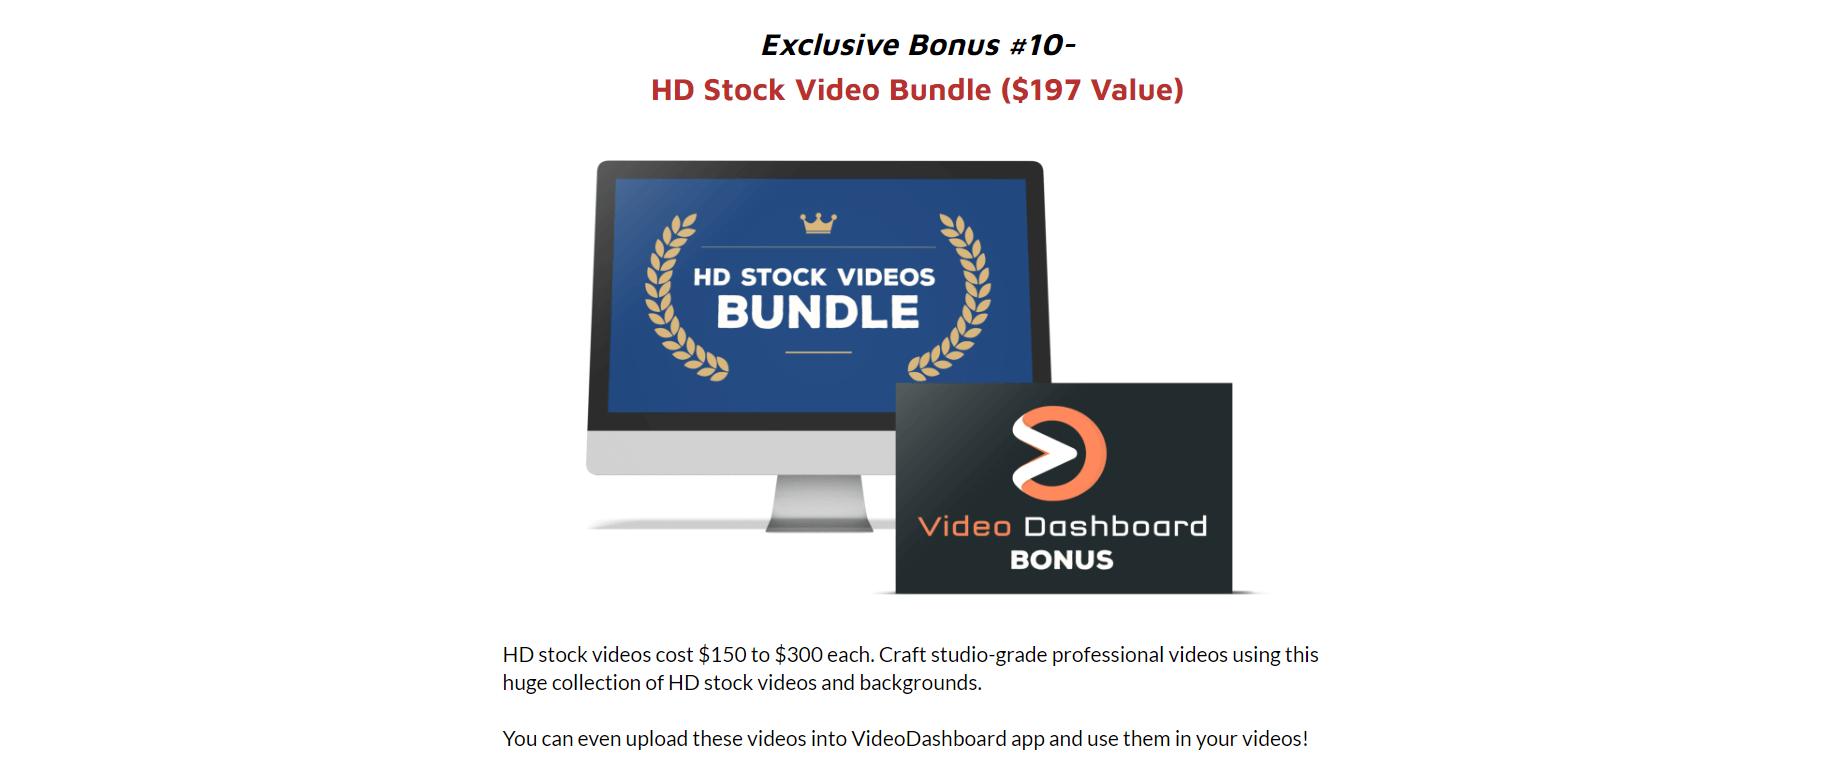 Video-Dashboard-Bonus-10